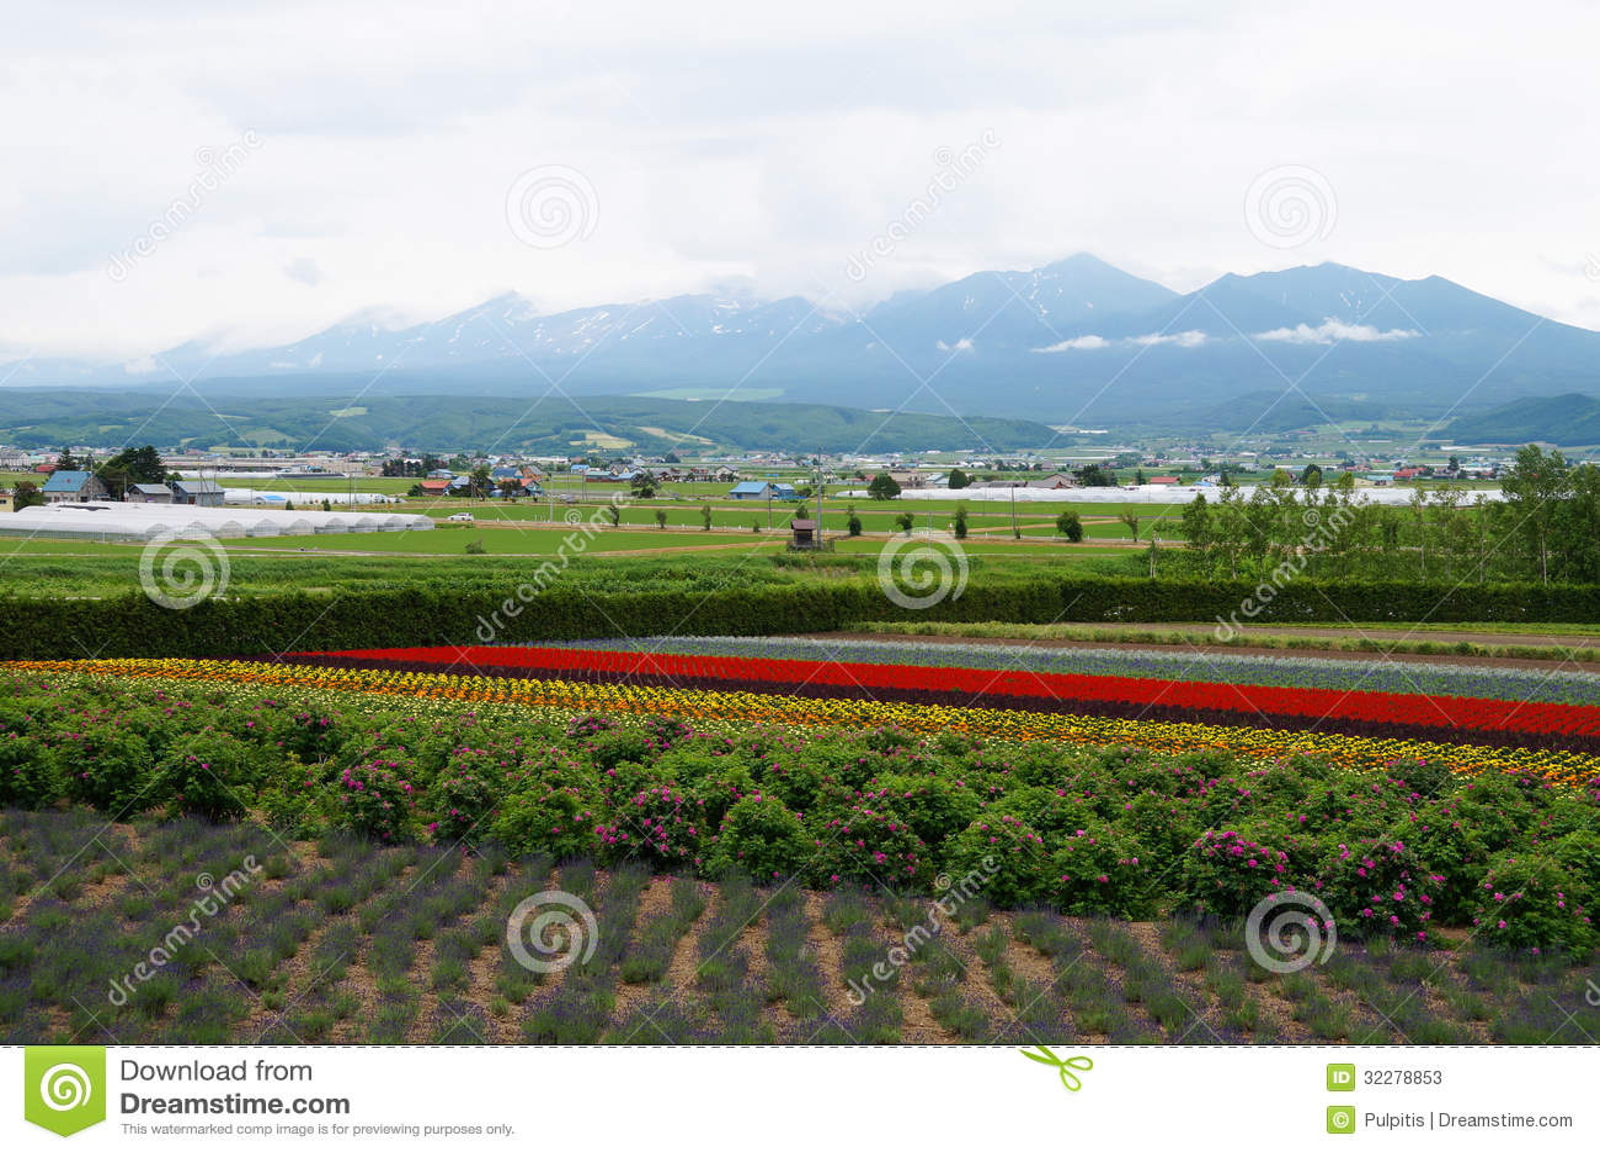 Flowers Farm In Sapporo Japan Stock s Image